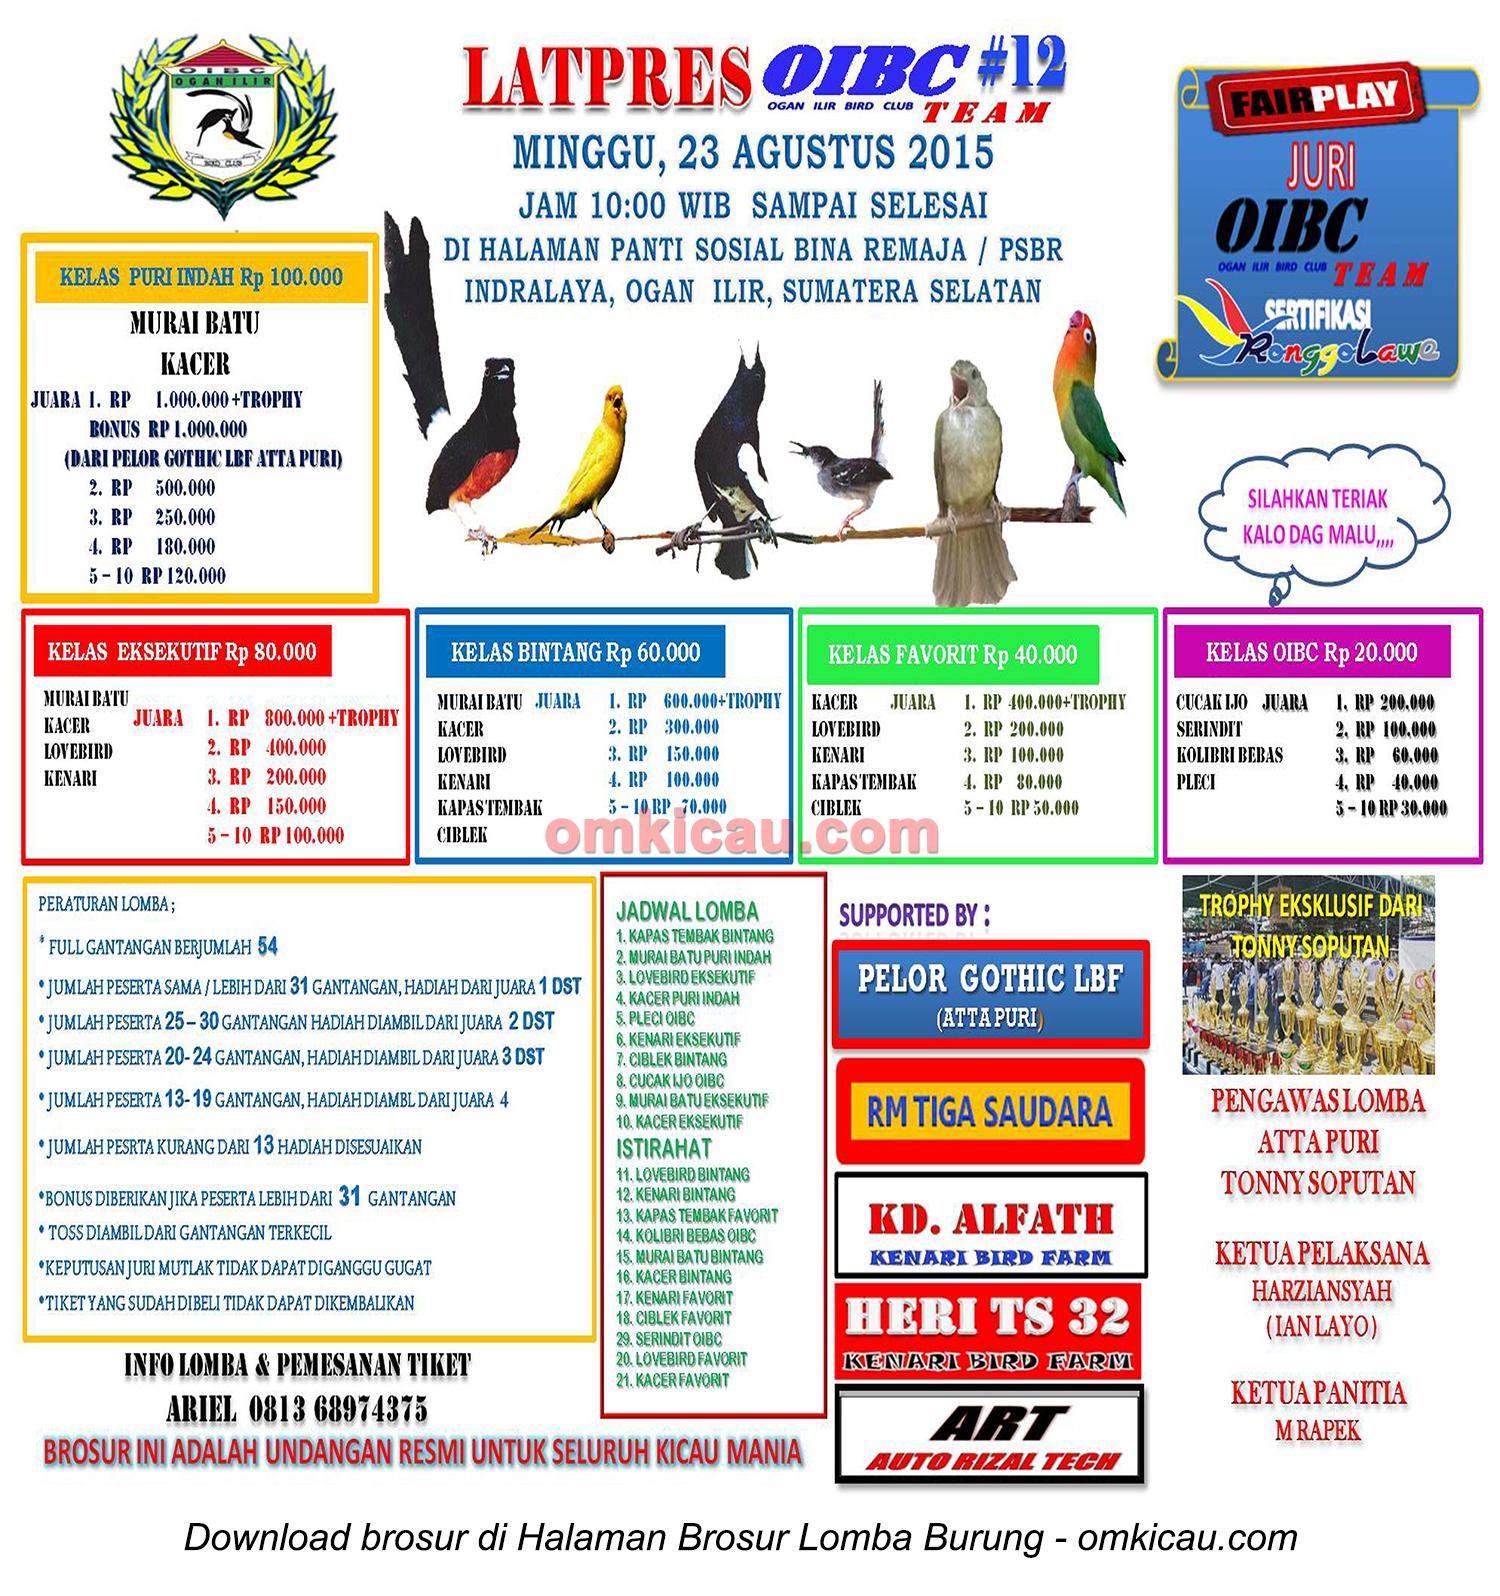 Brosur Latpres Burung Berkicau OIBC #12, Ogan Ilir, 23 Agustus 2015